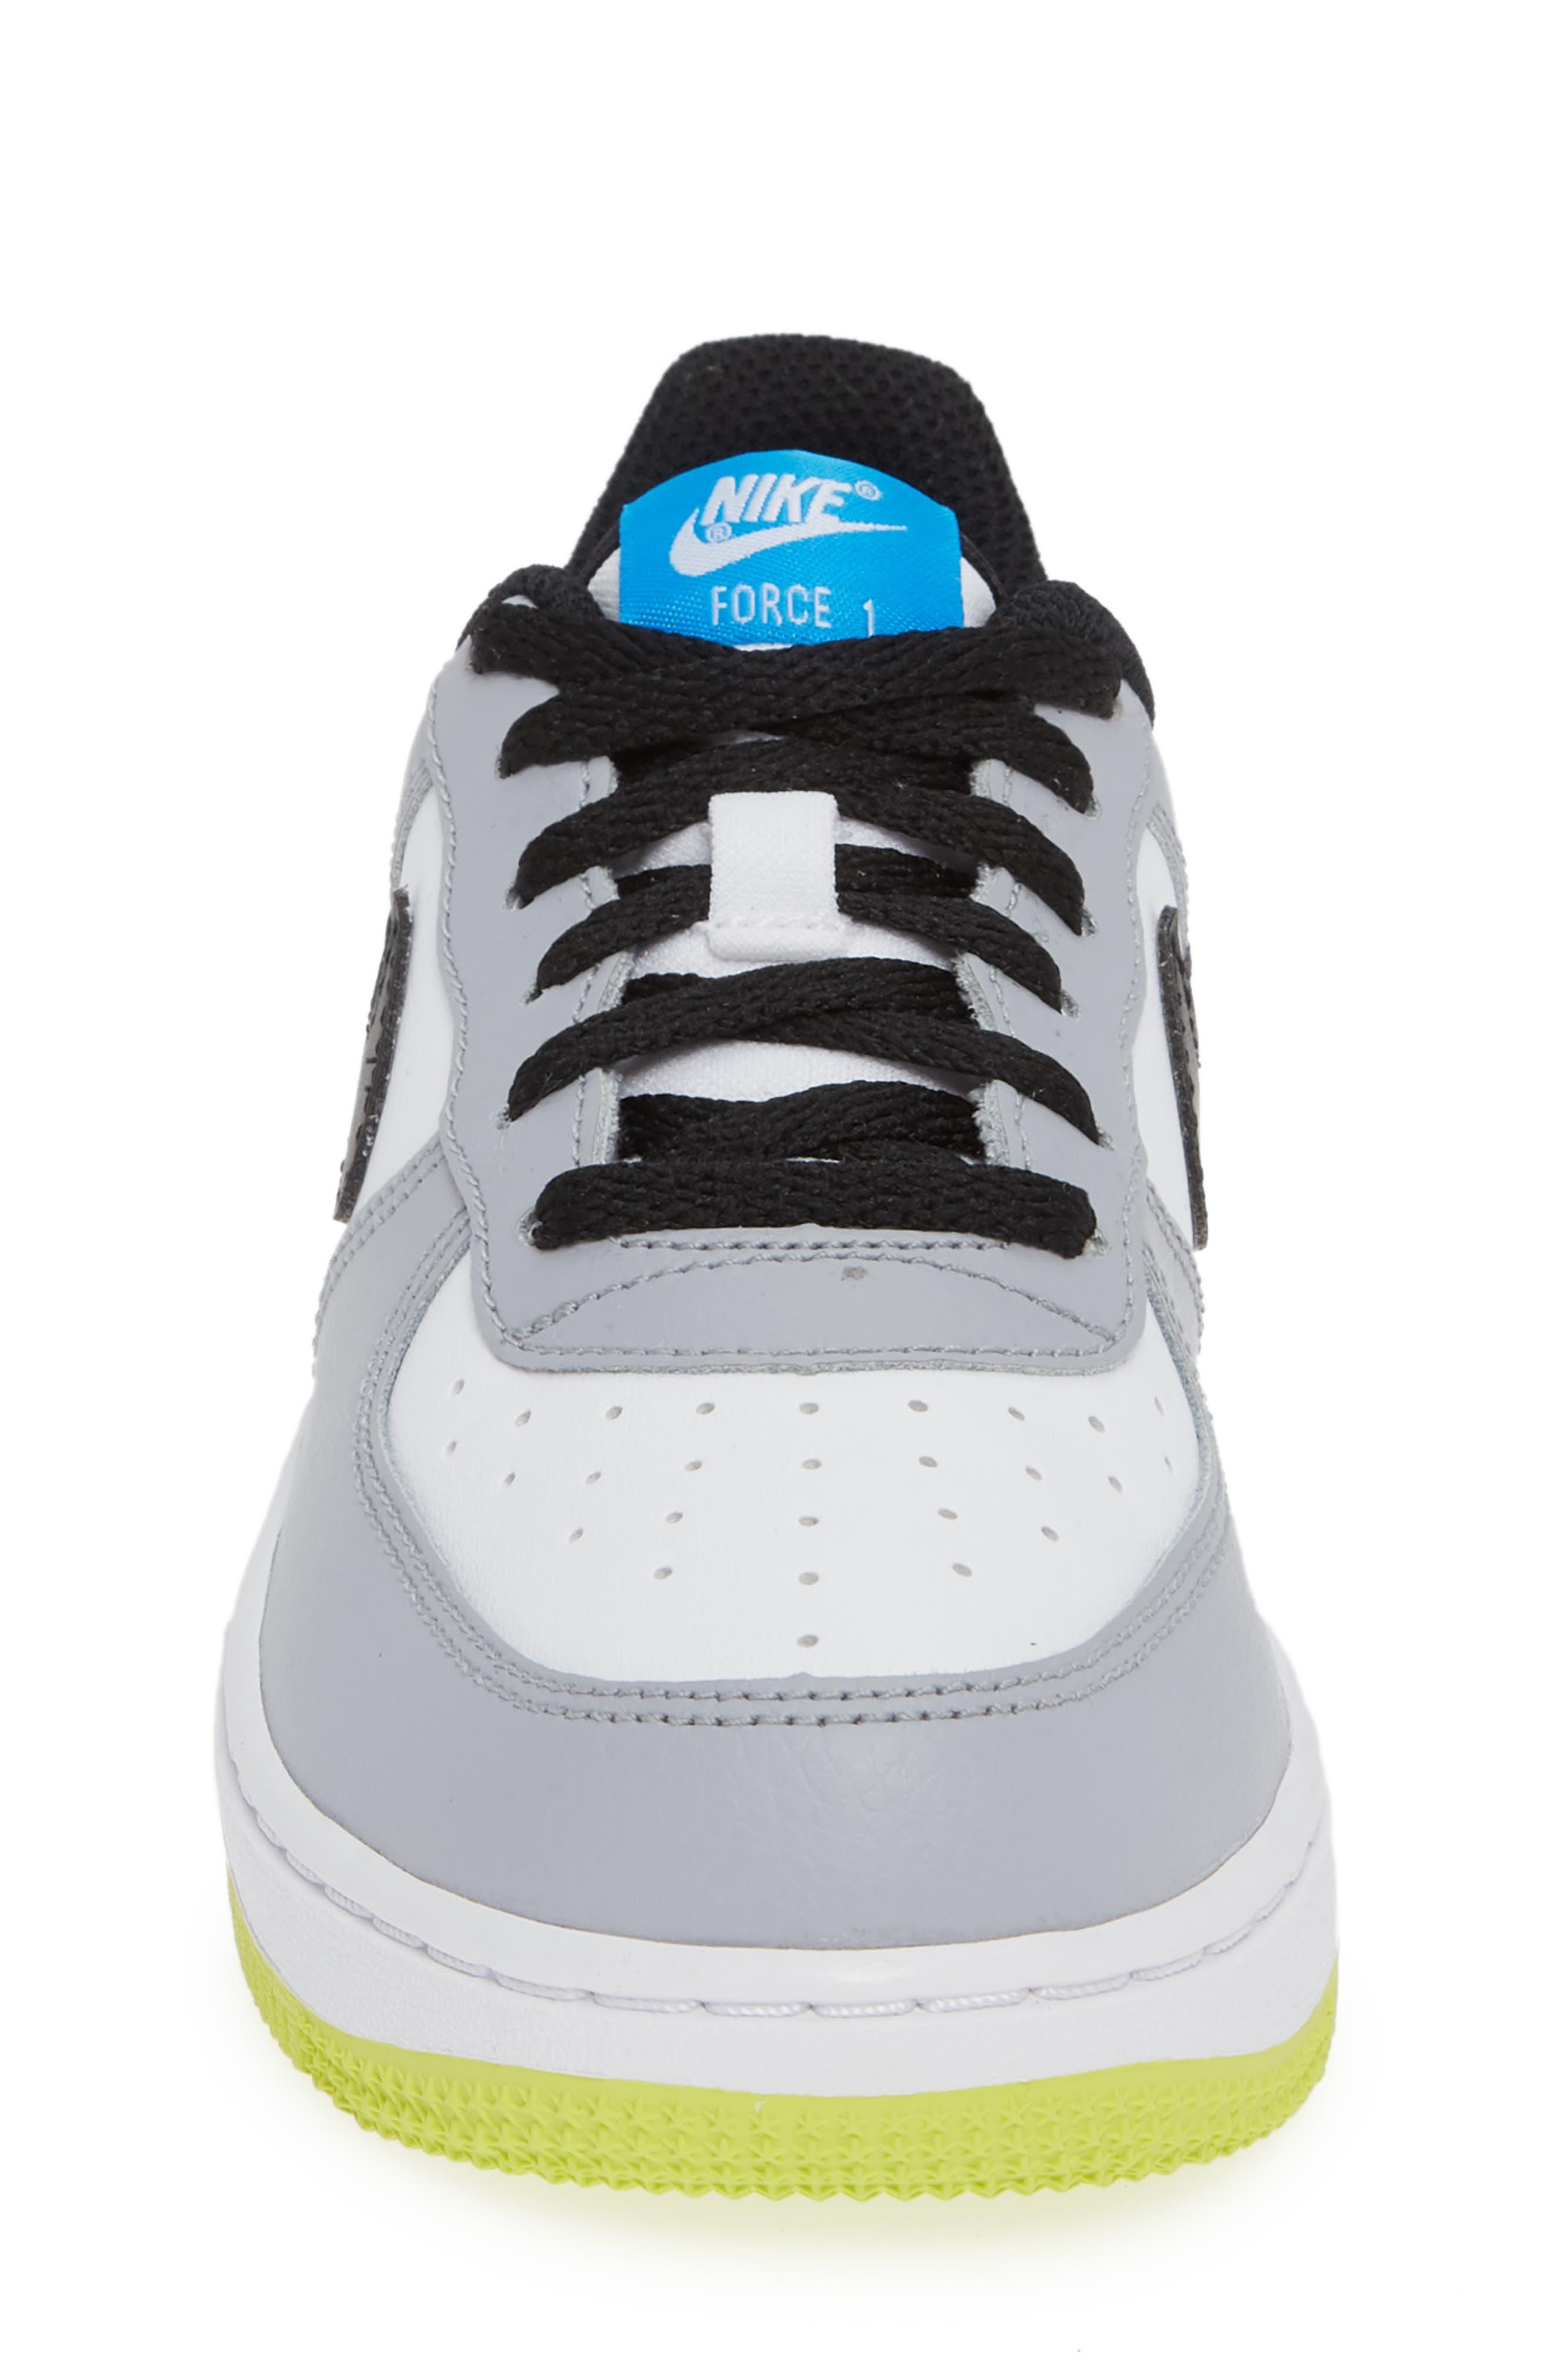 Air Force 1 Sneaker,                             Alternate thumbnail 3, color,                             Wolf Grey/ Black/ White/ Blue